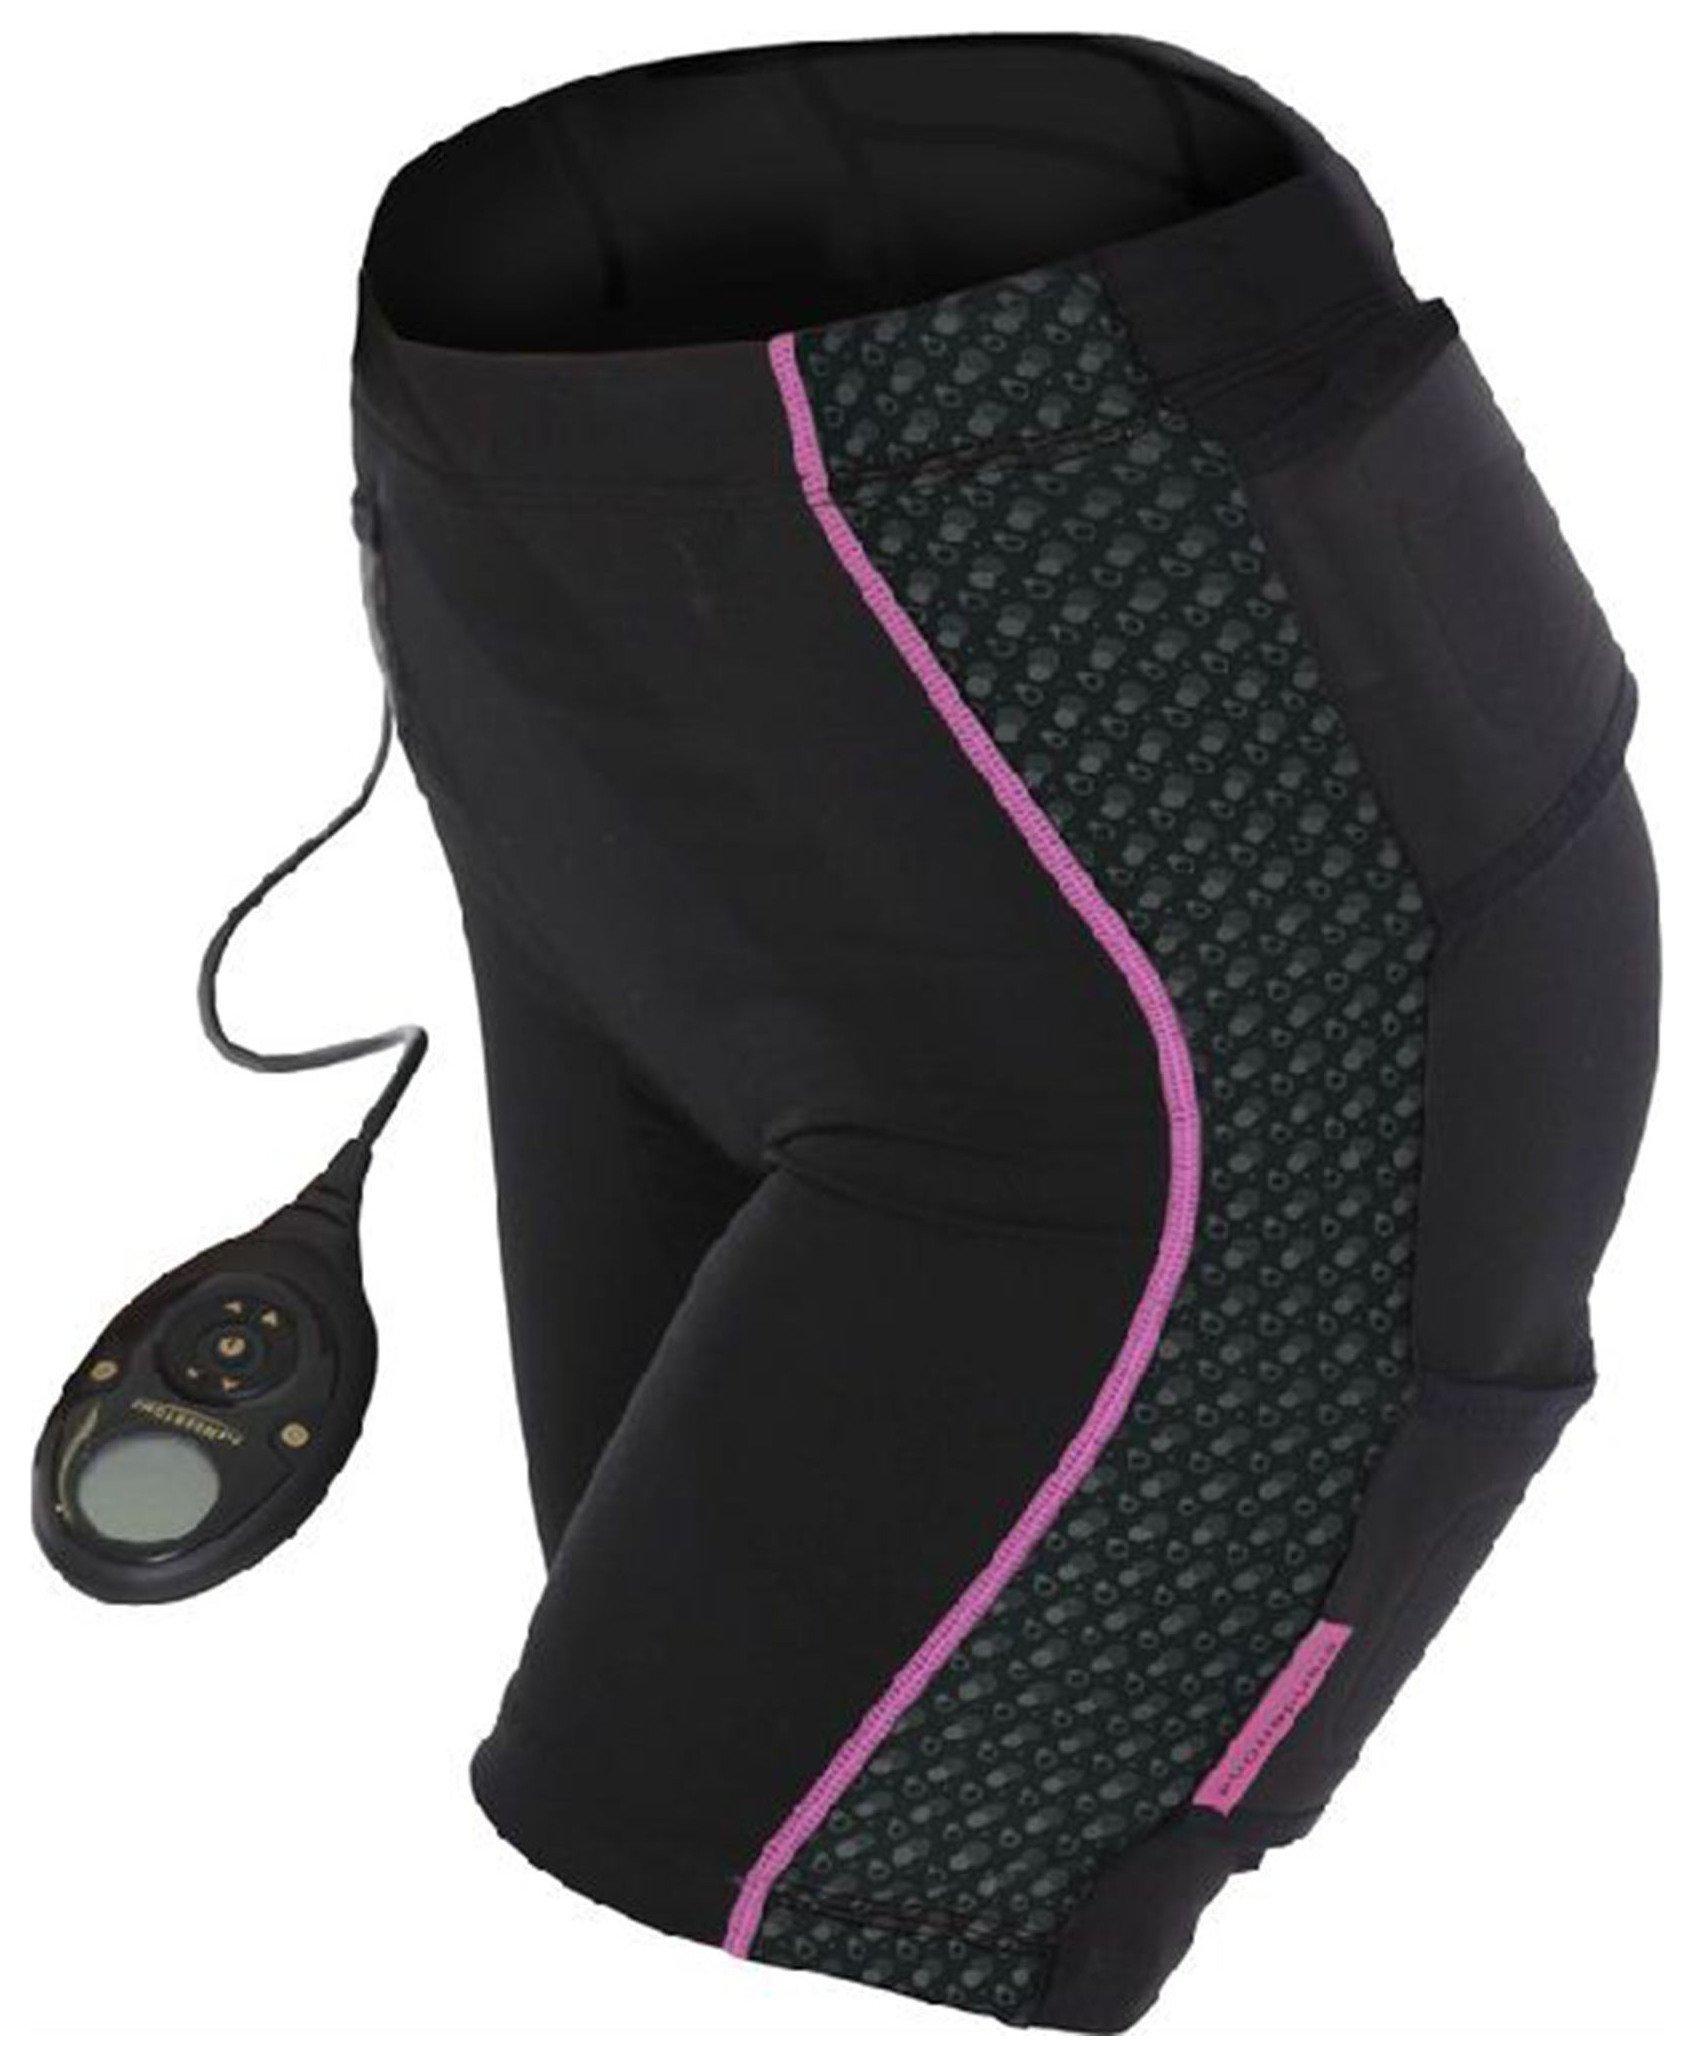 Slendertone Advanced Bottom Toning Shorts - Women's